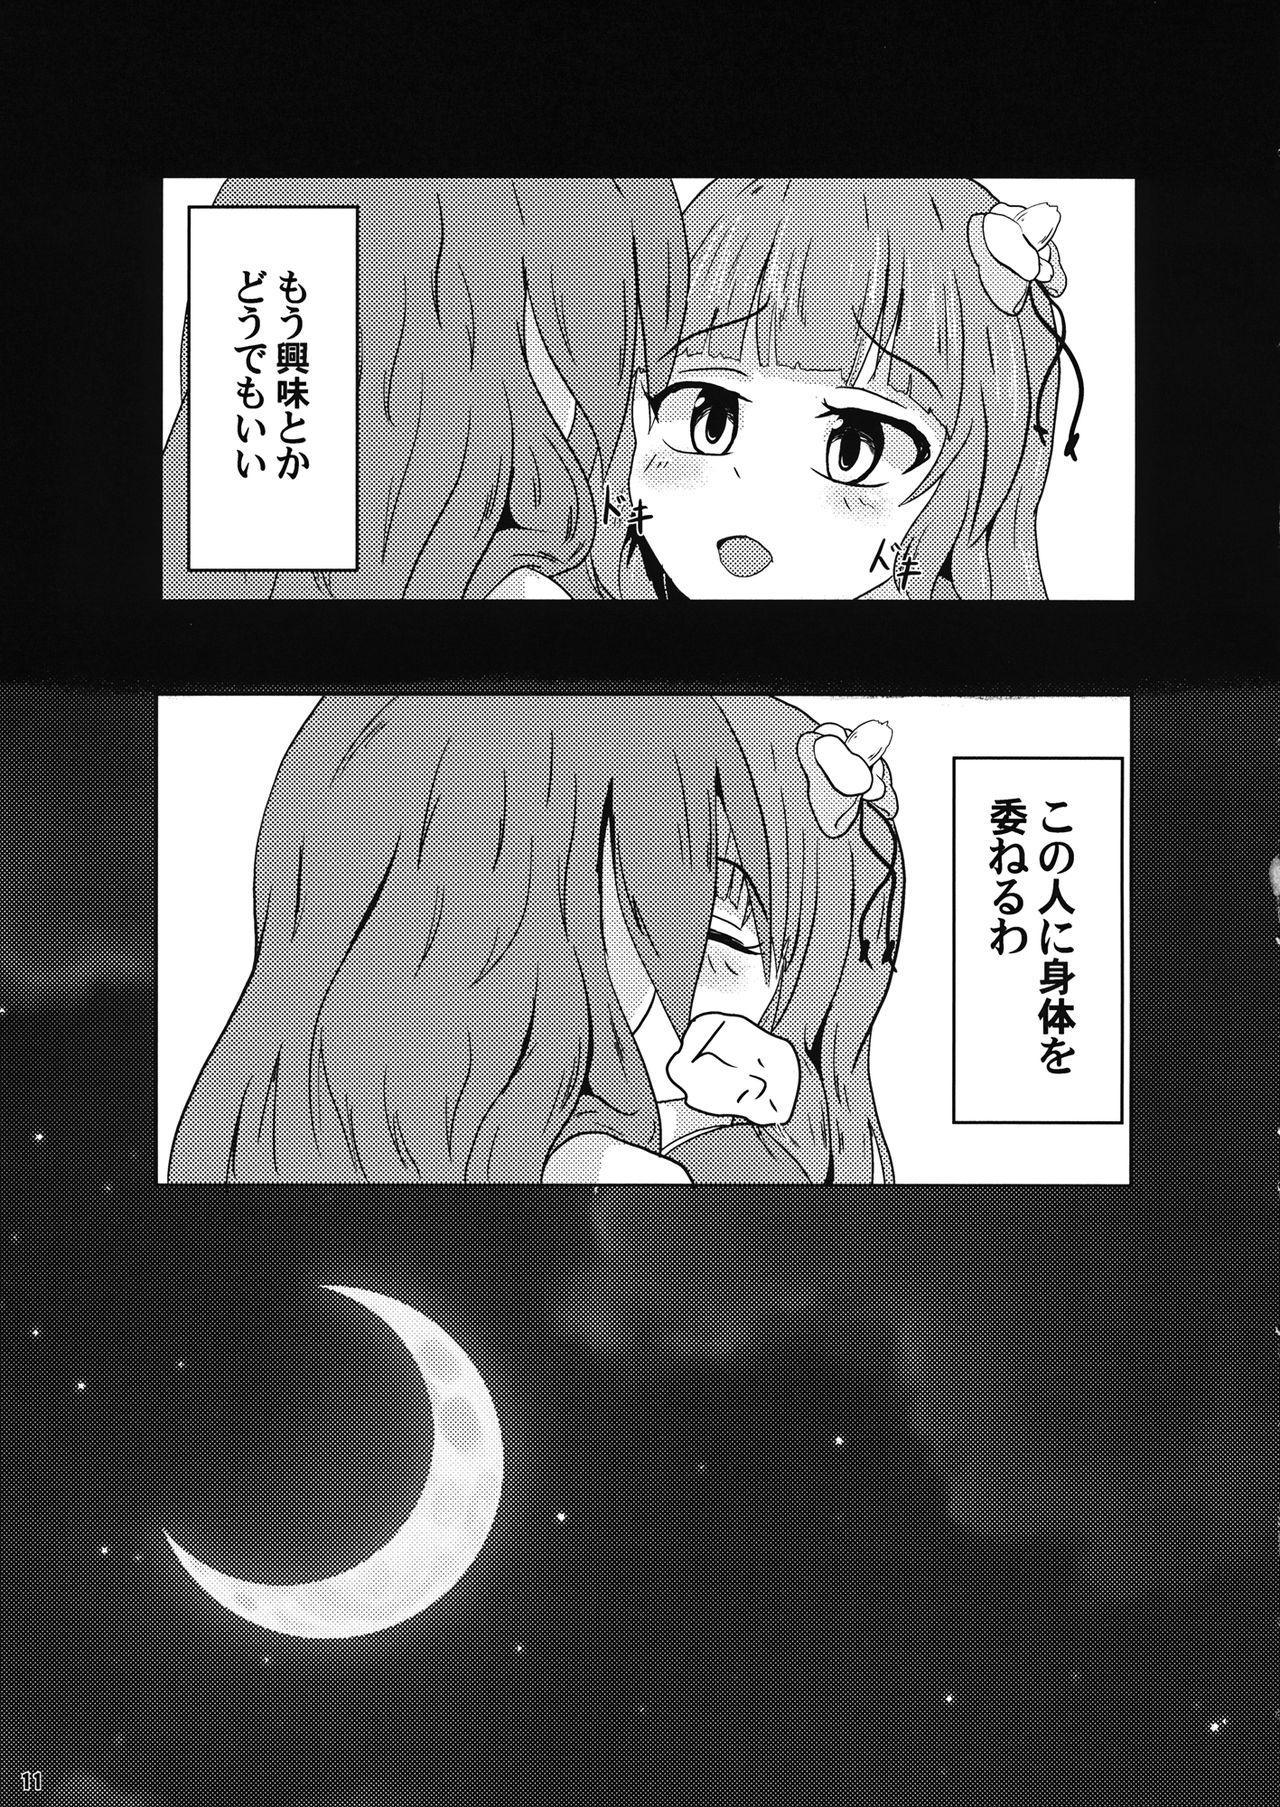 Ochiru Otome to Bakedanuki 11